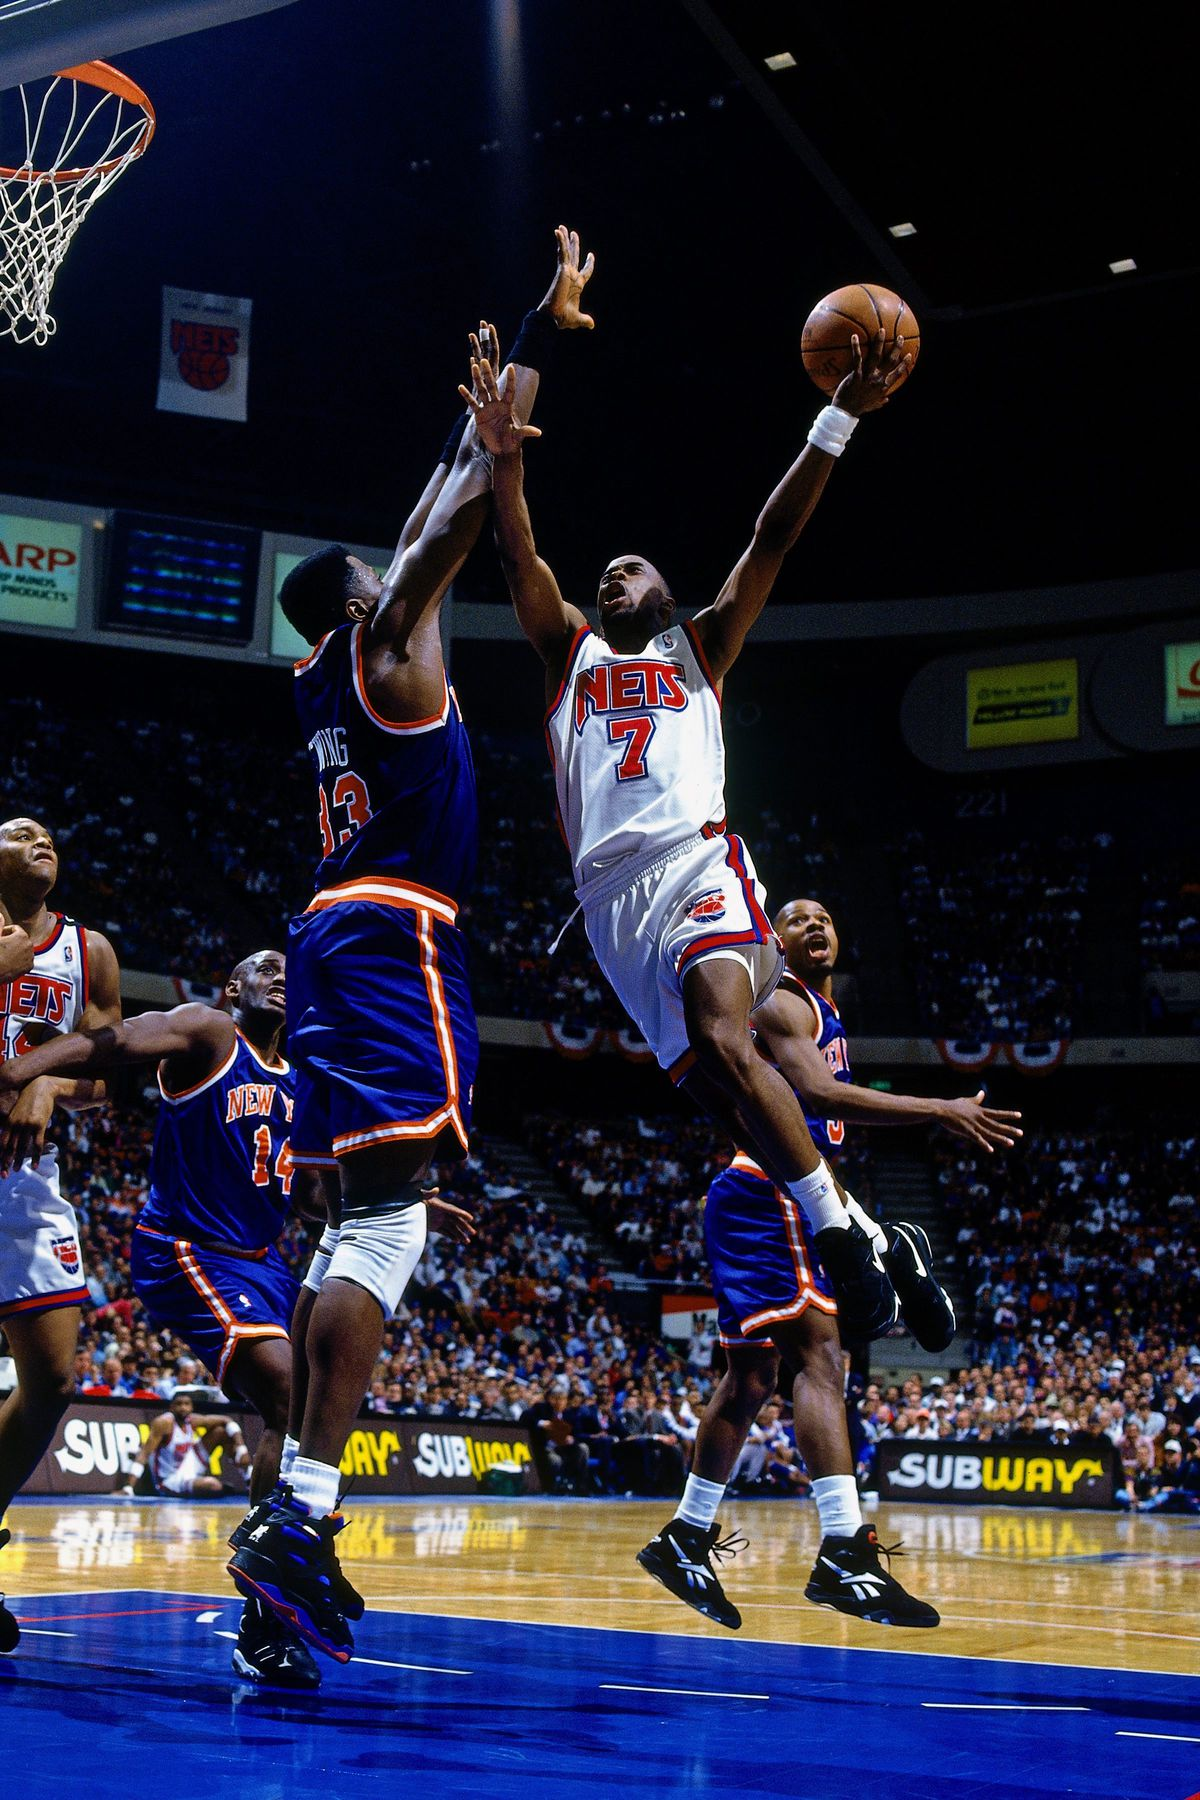 New York Knicks vs. New Jersey Nets, Game 3